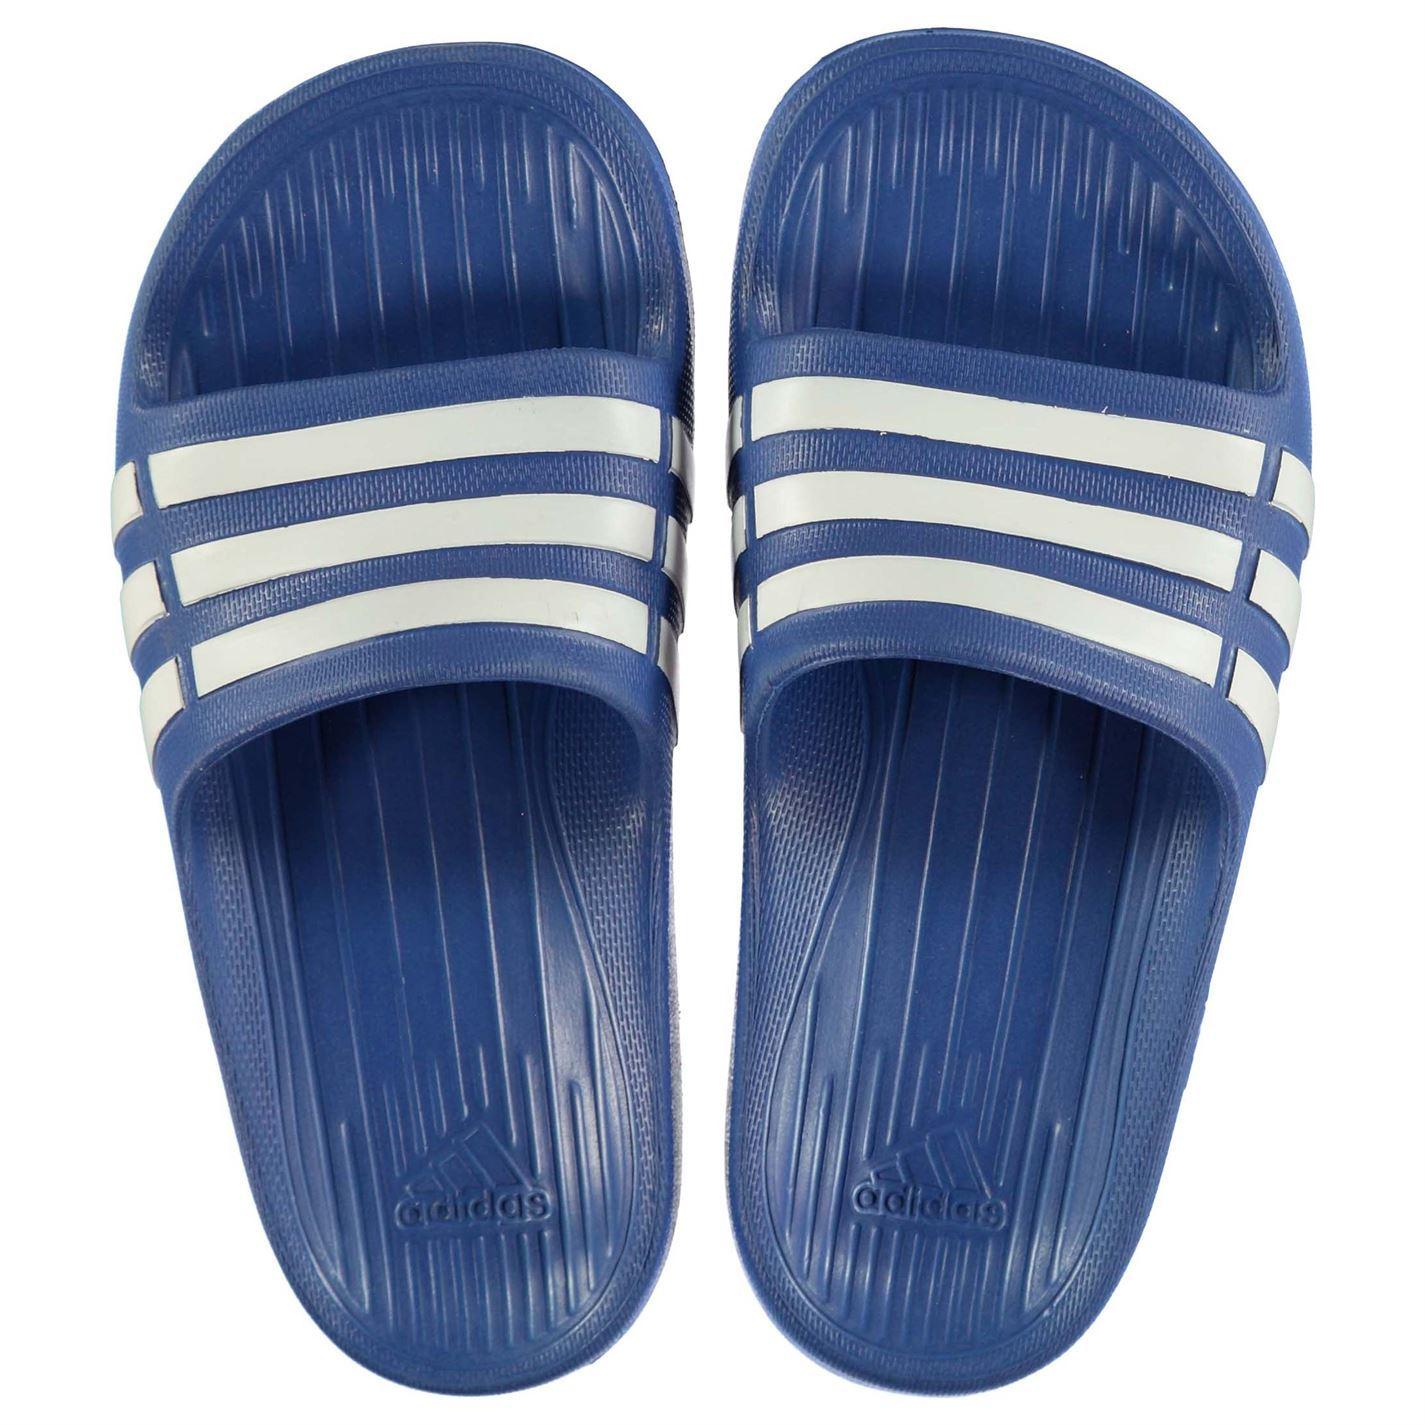 Details about adidas Duramo Slide Pool Shoes Childs Boys Sandals Flip Flop Beach Shoes Thongs